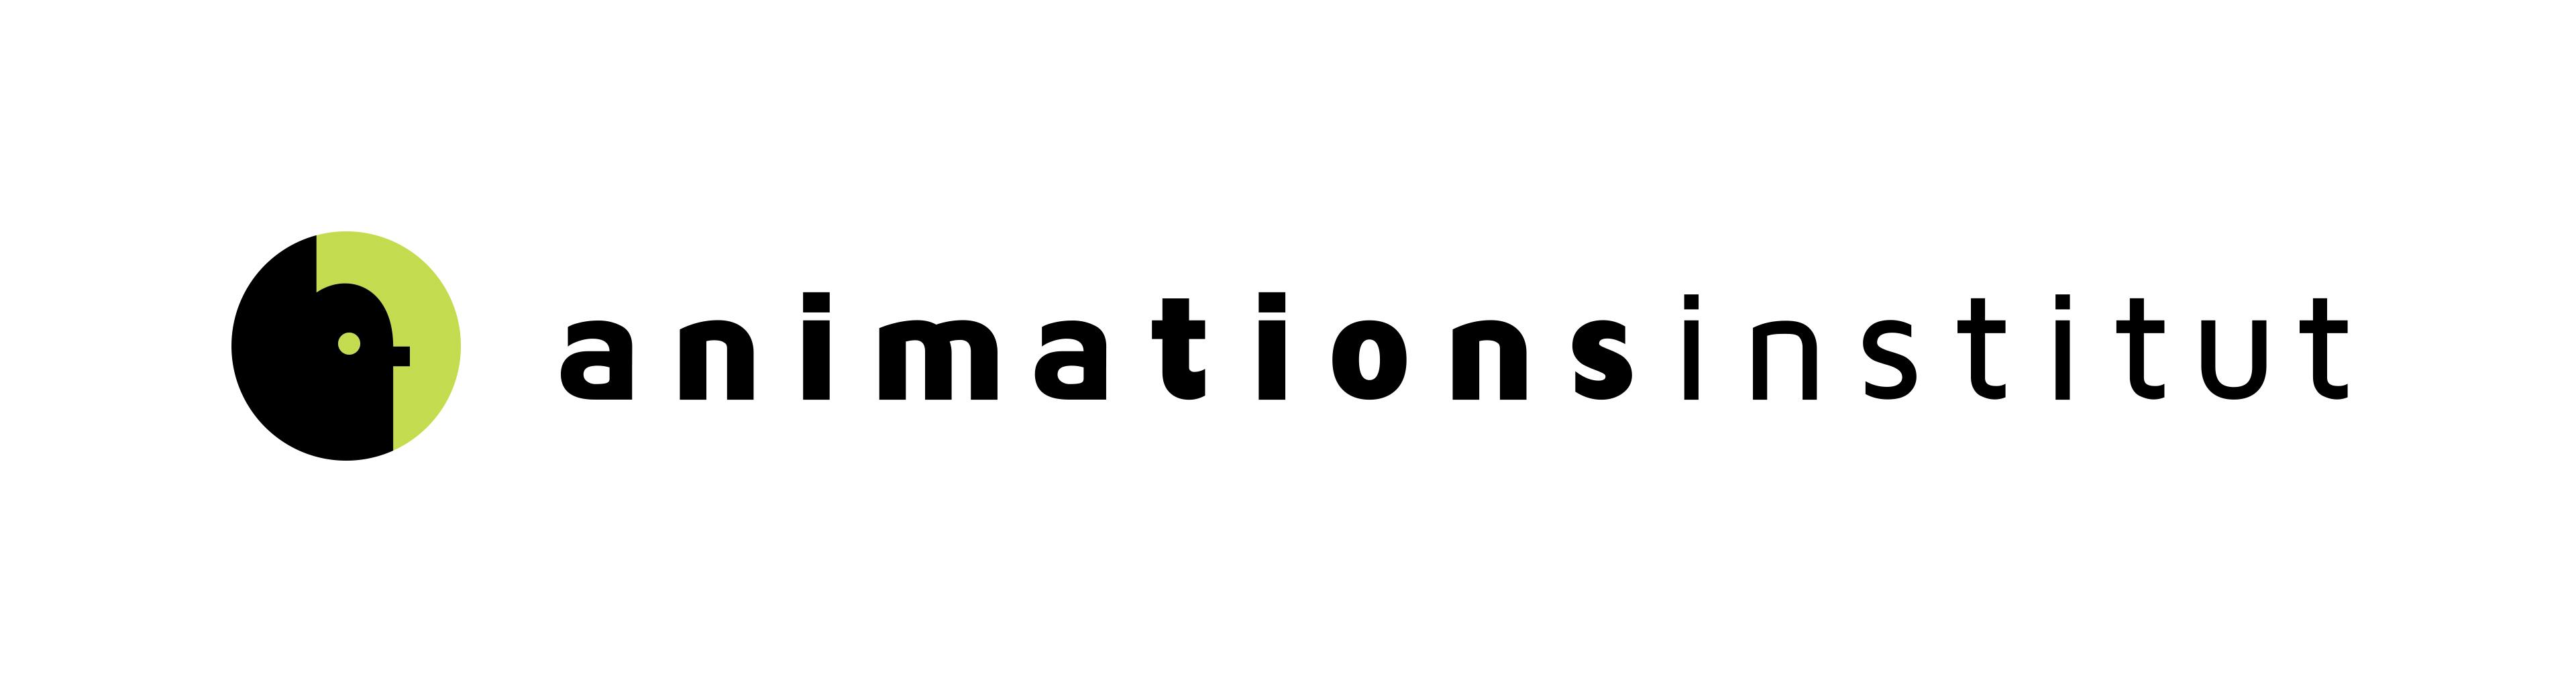 Filmakademie Baden-Württemberg, Animationsinstitut